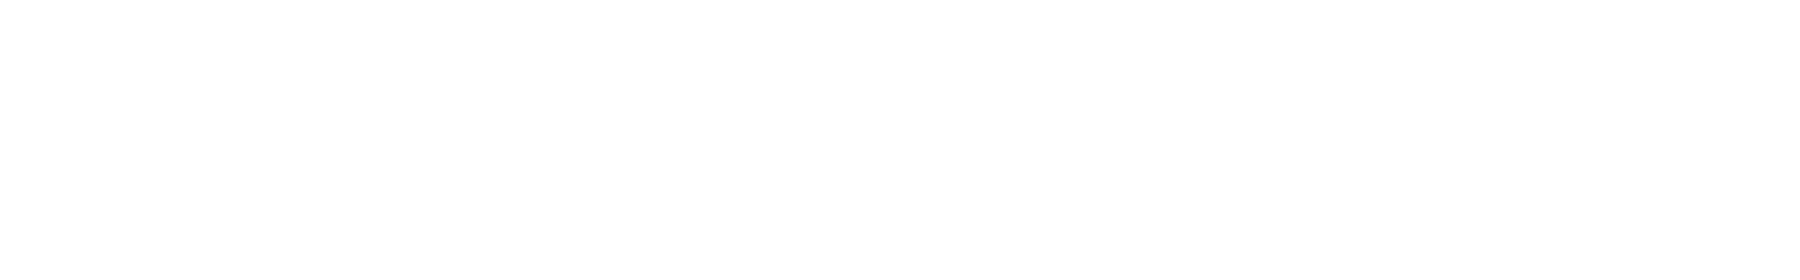 vuf1 140bpm trance athmo 1 8bars f